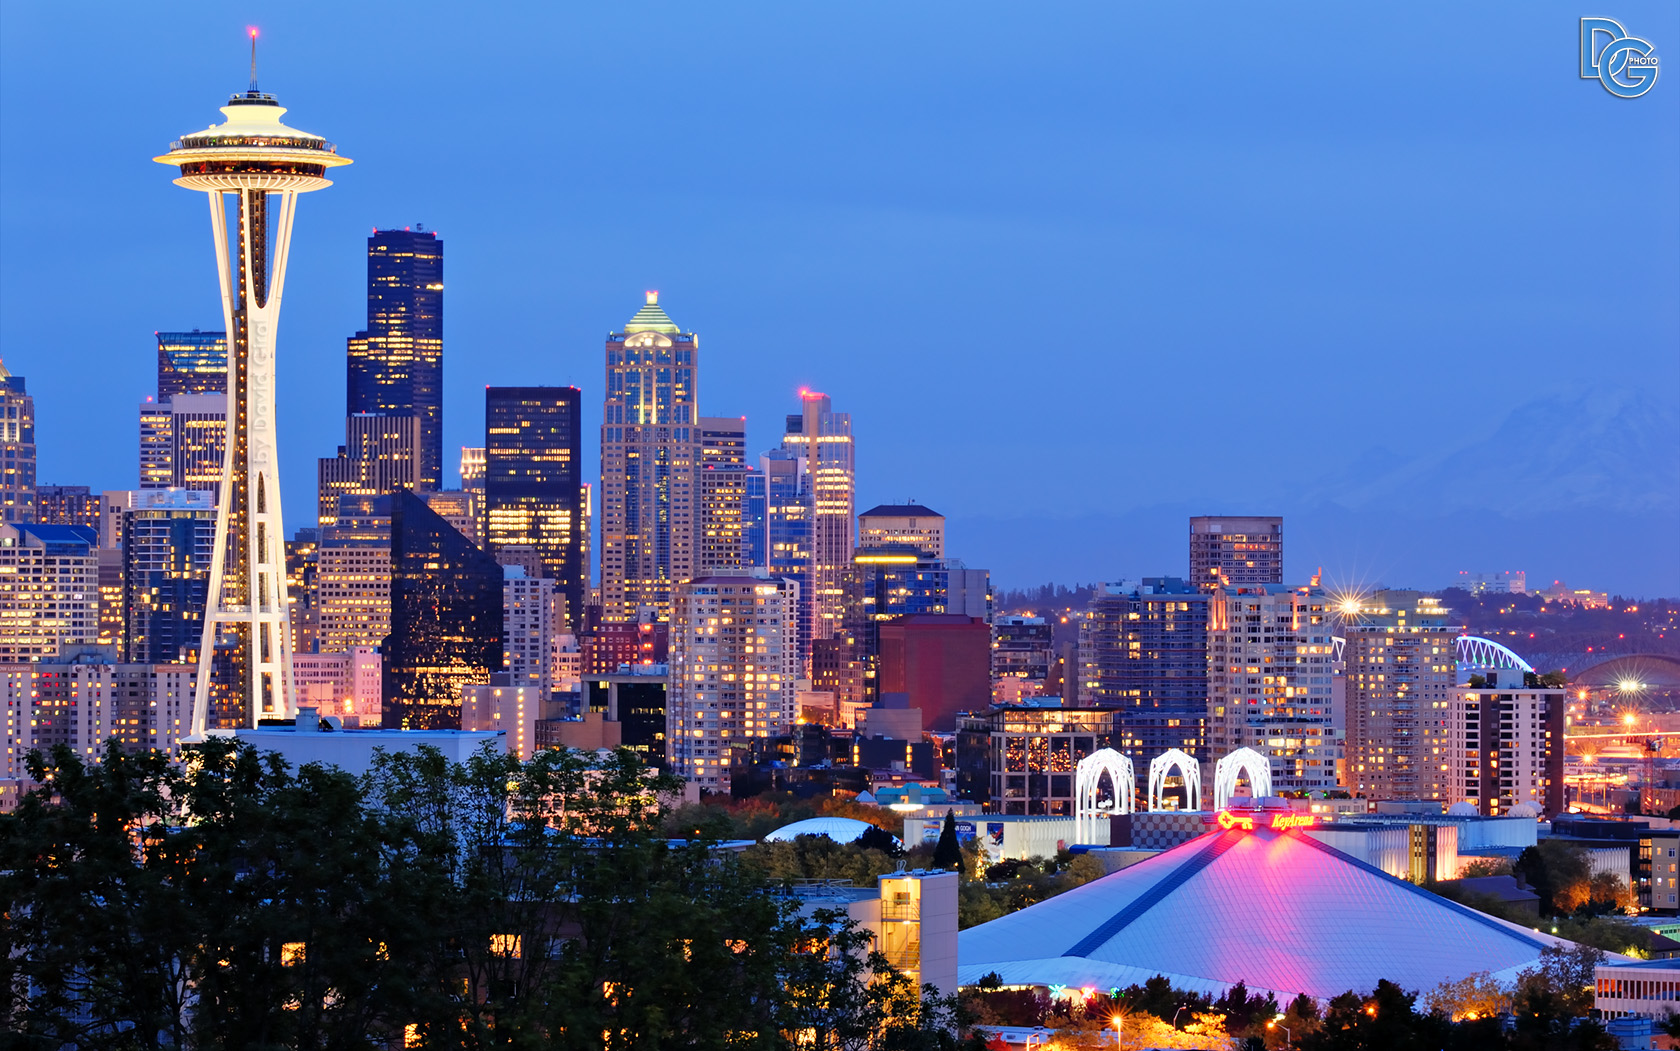 Seattle Washington In Fall City Night Wallpaper Landscape Photography Top 10 Photos Of 2009 David Giral